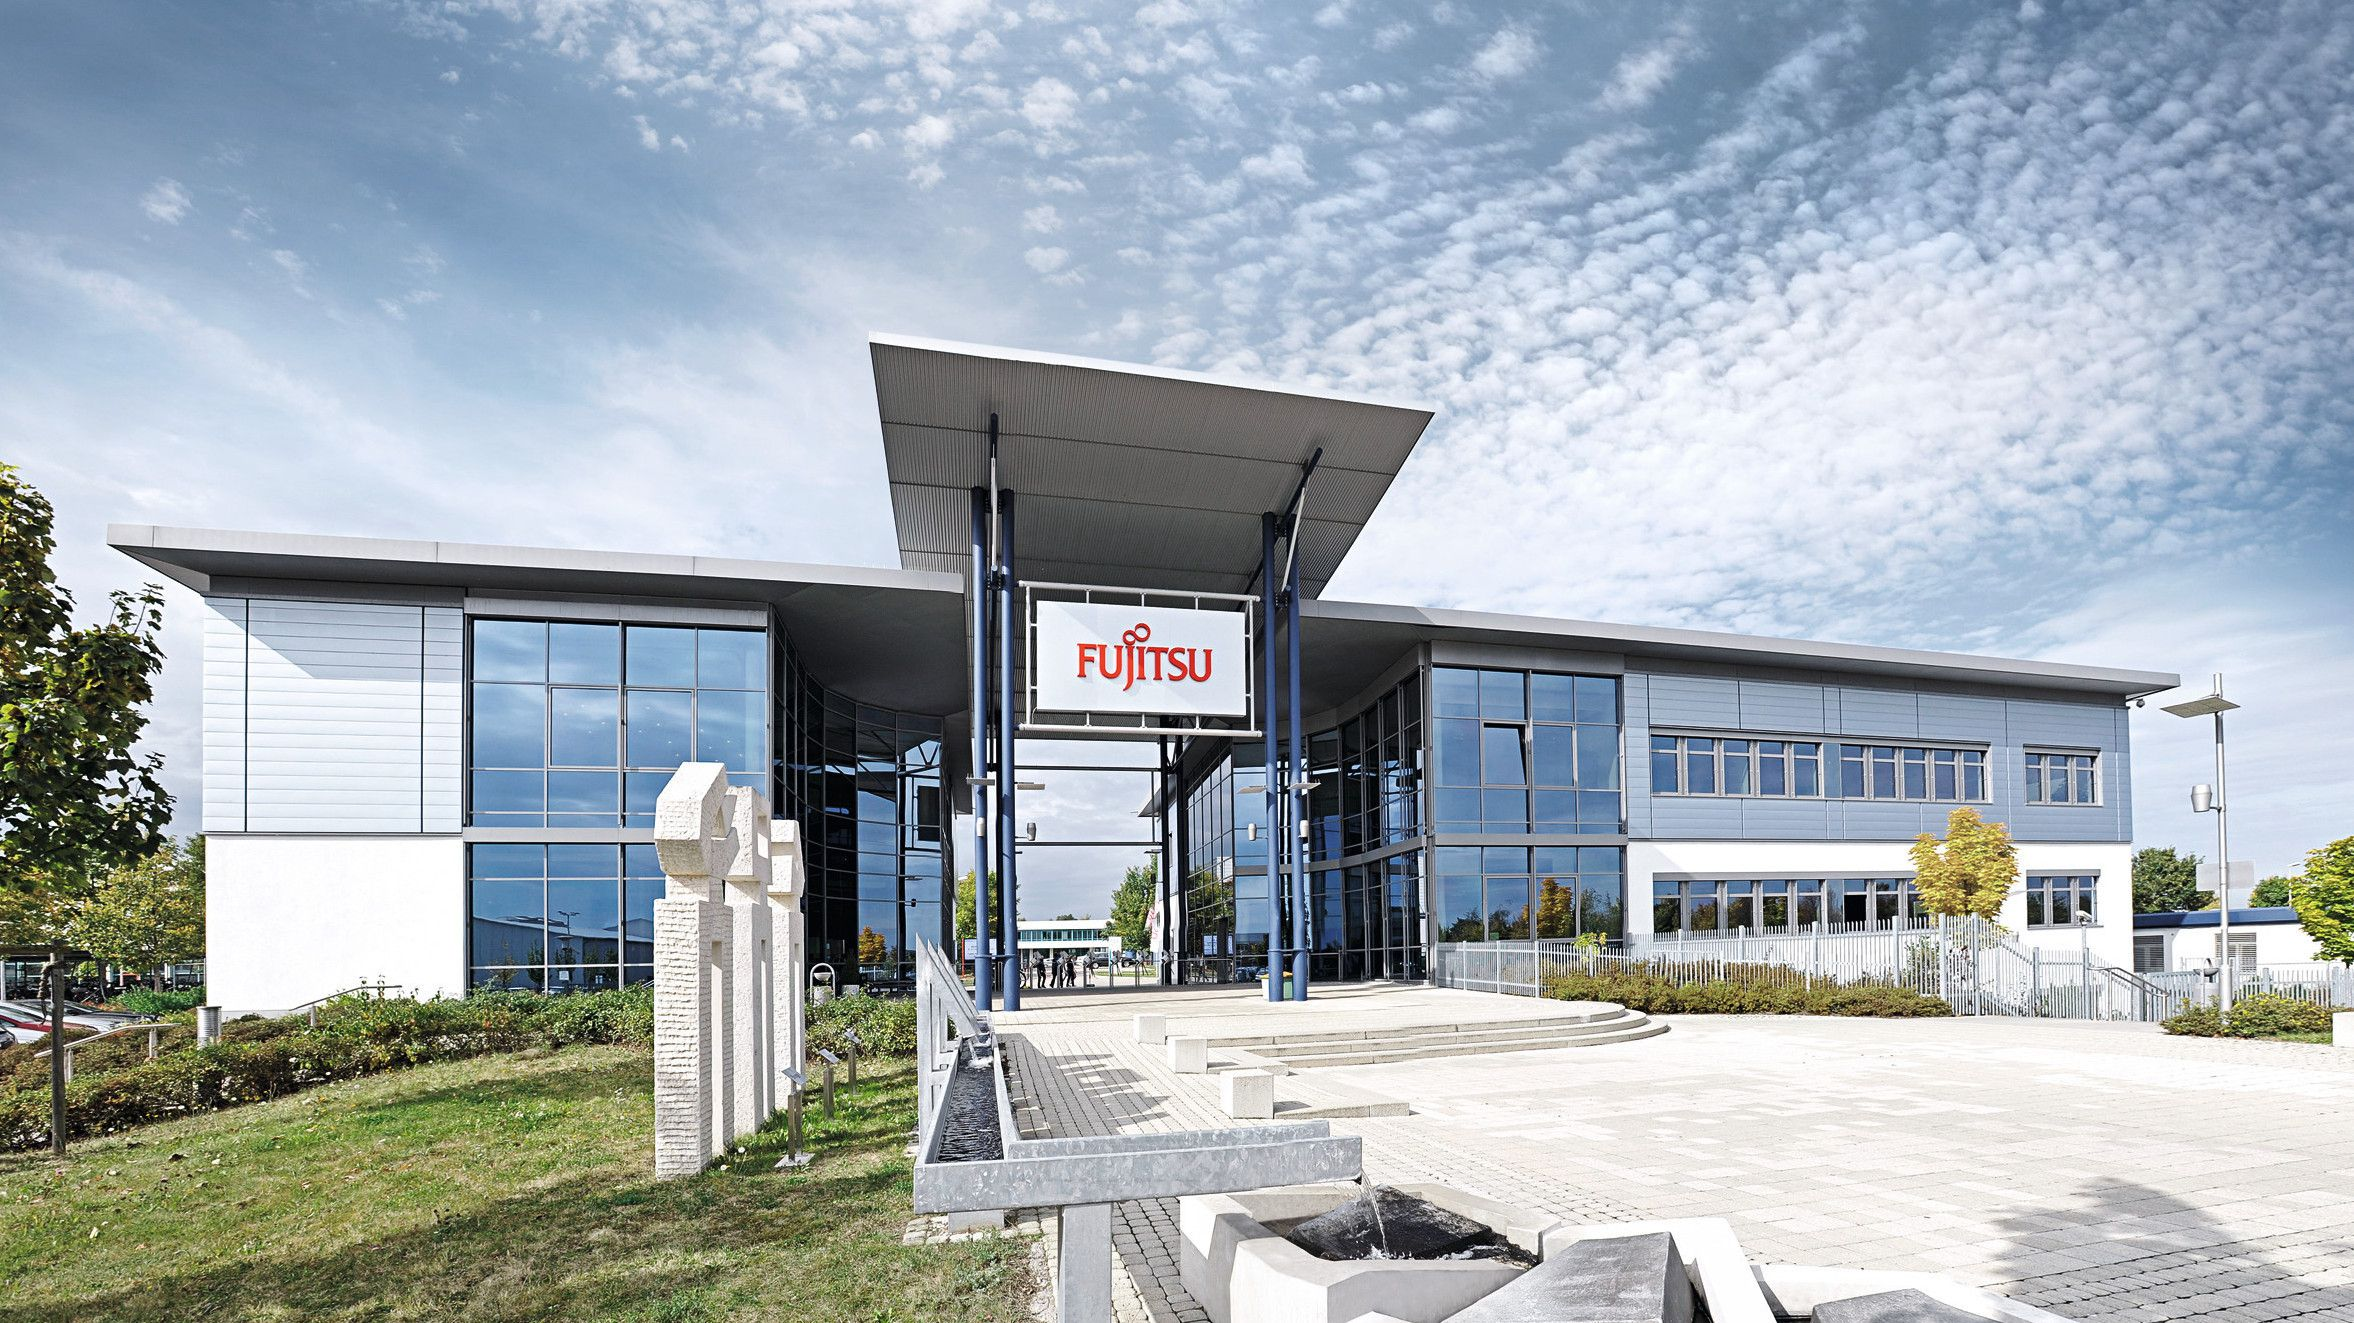 Fujitsu-fabrikken i Augsburg